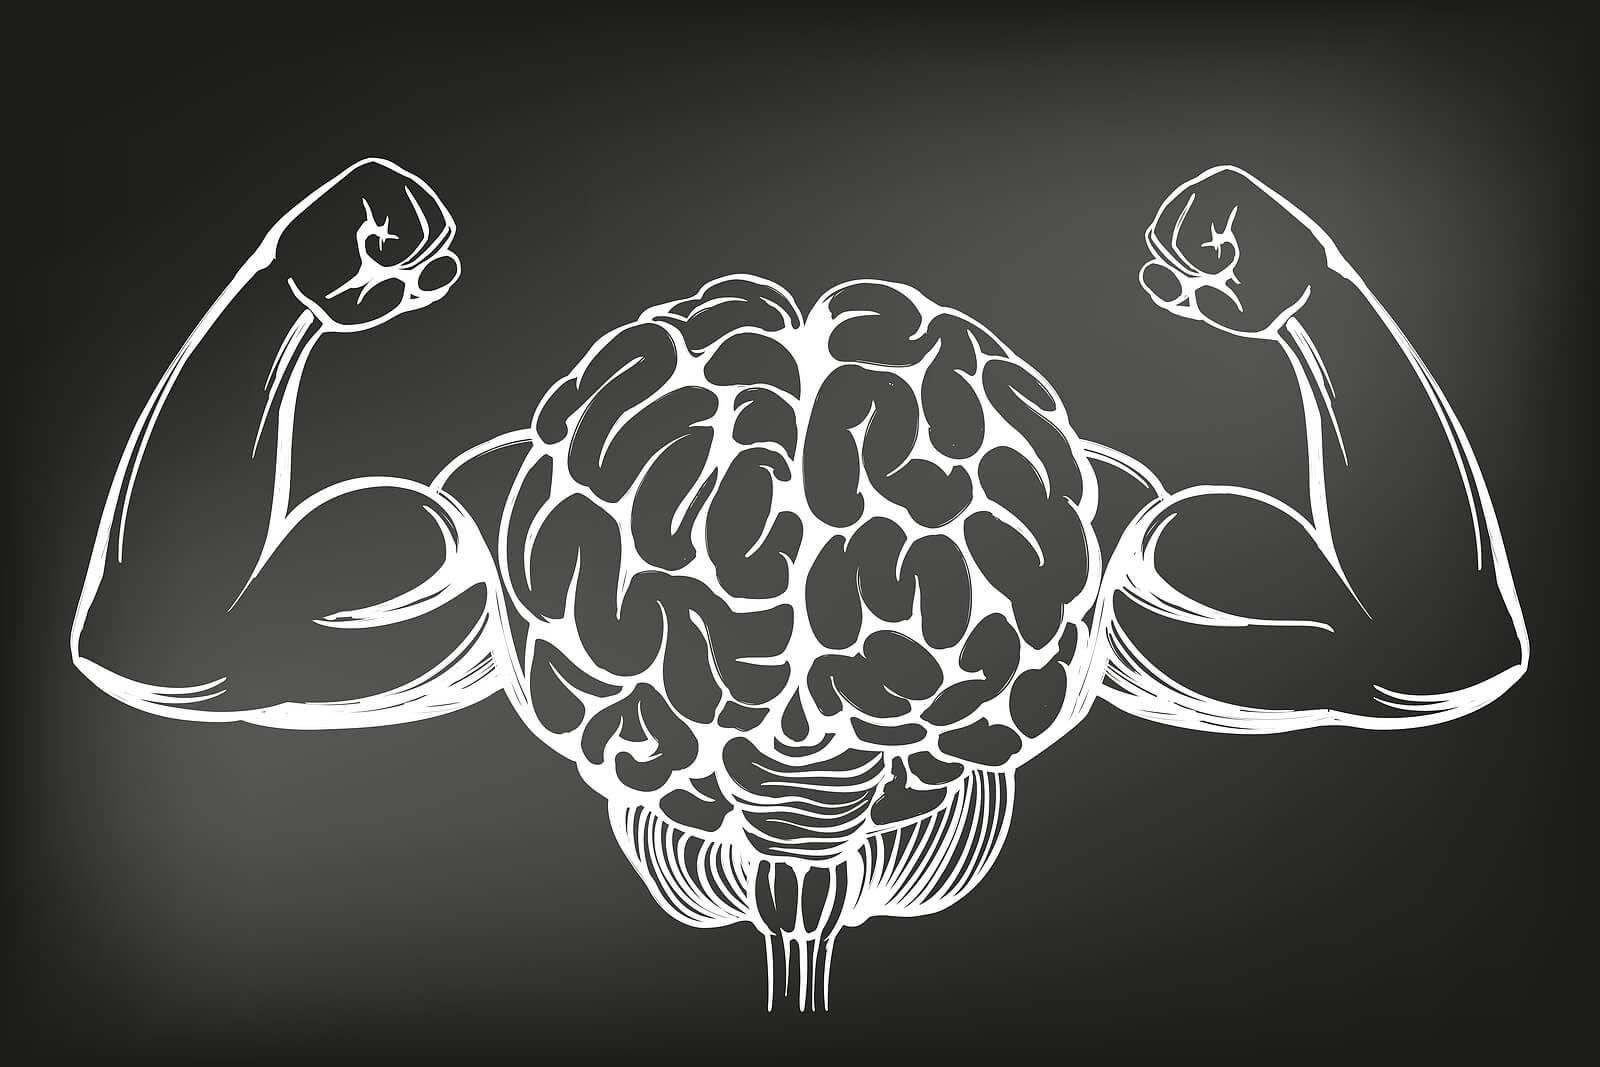 Cerebro se fortalece jugando sudoku.